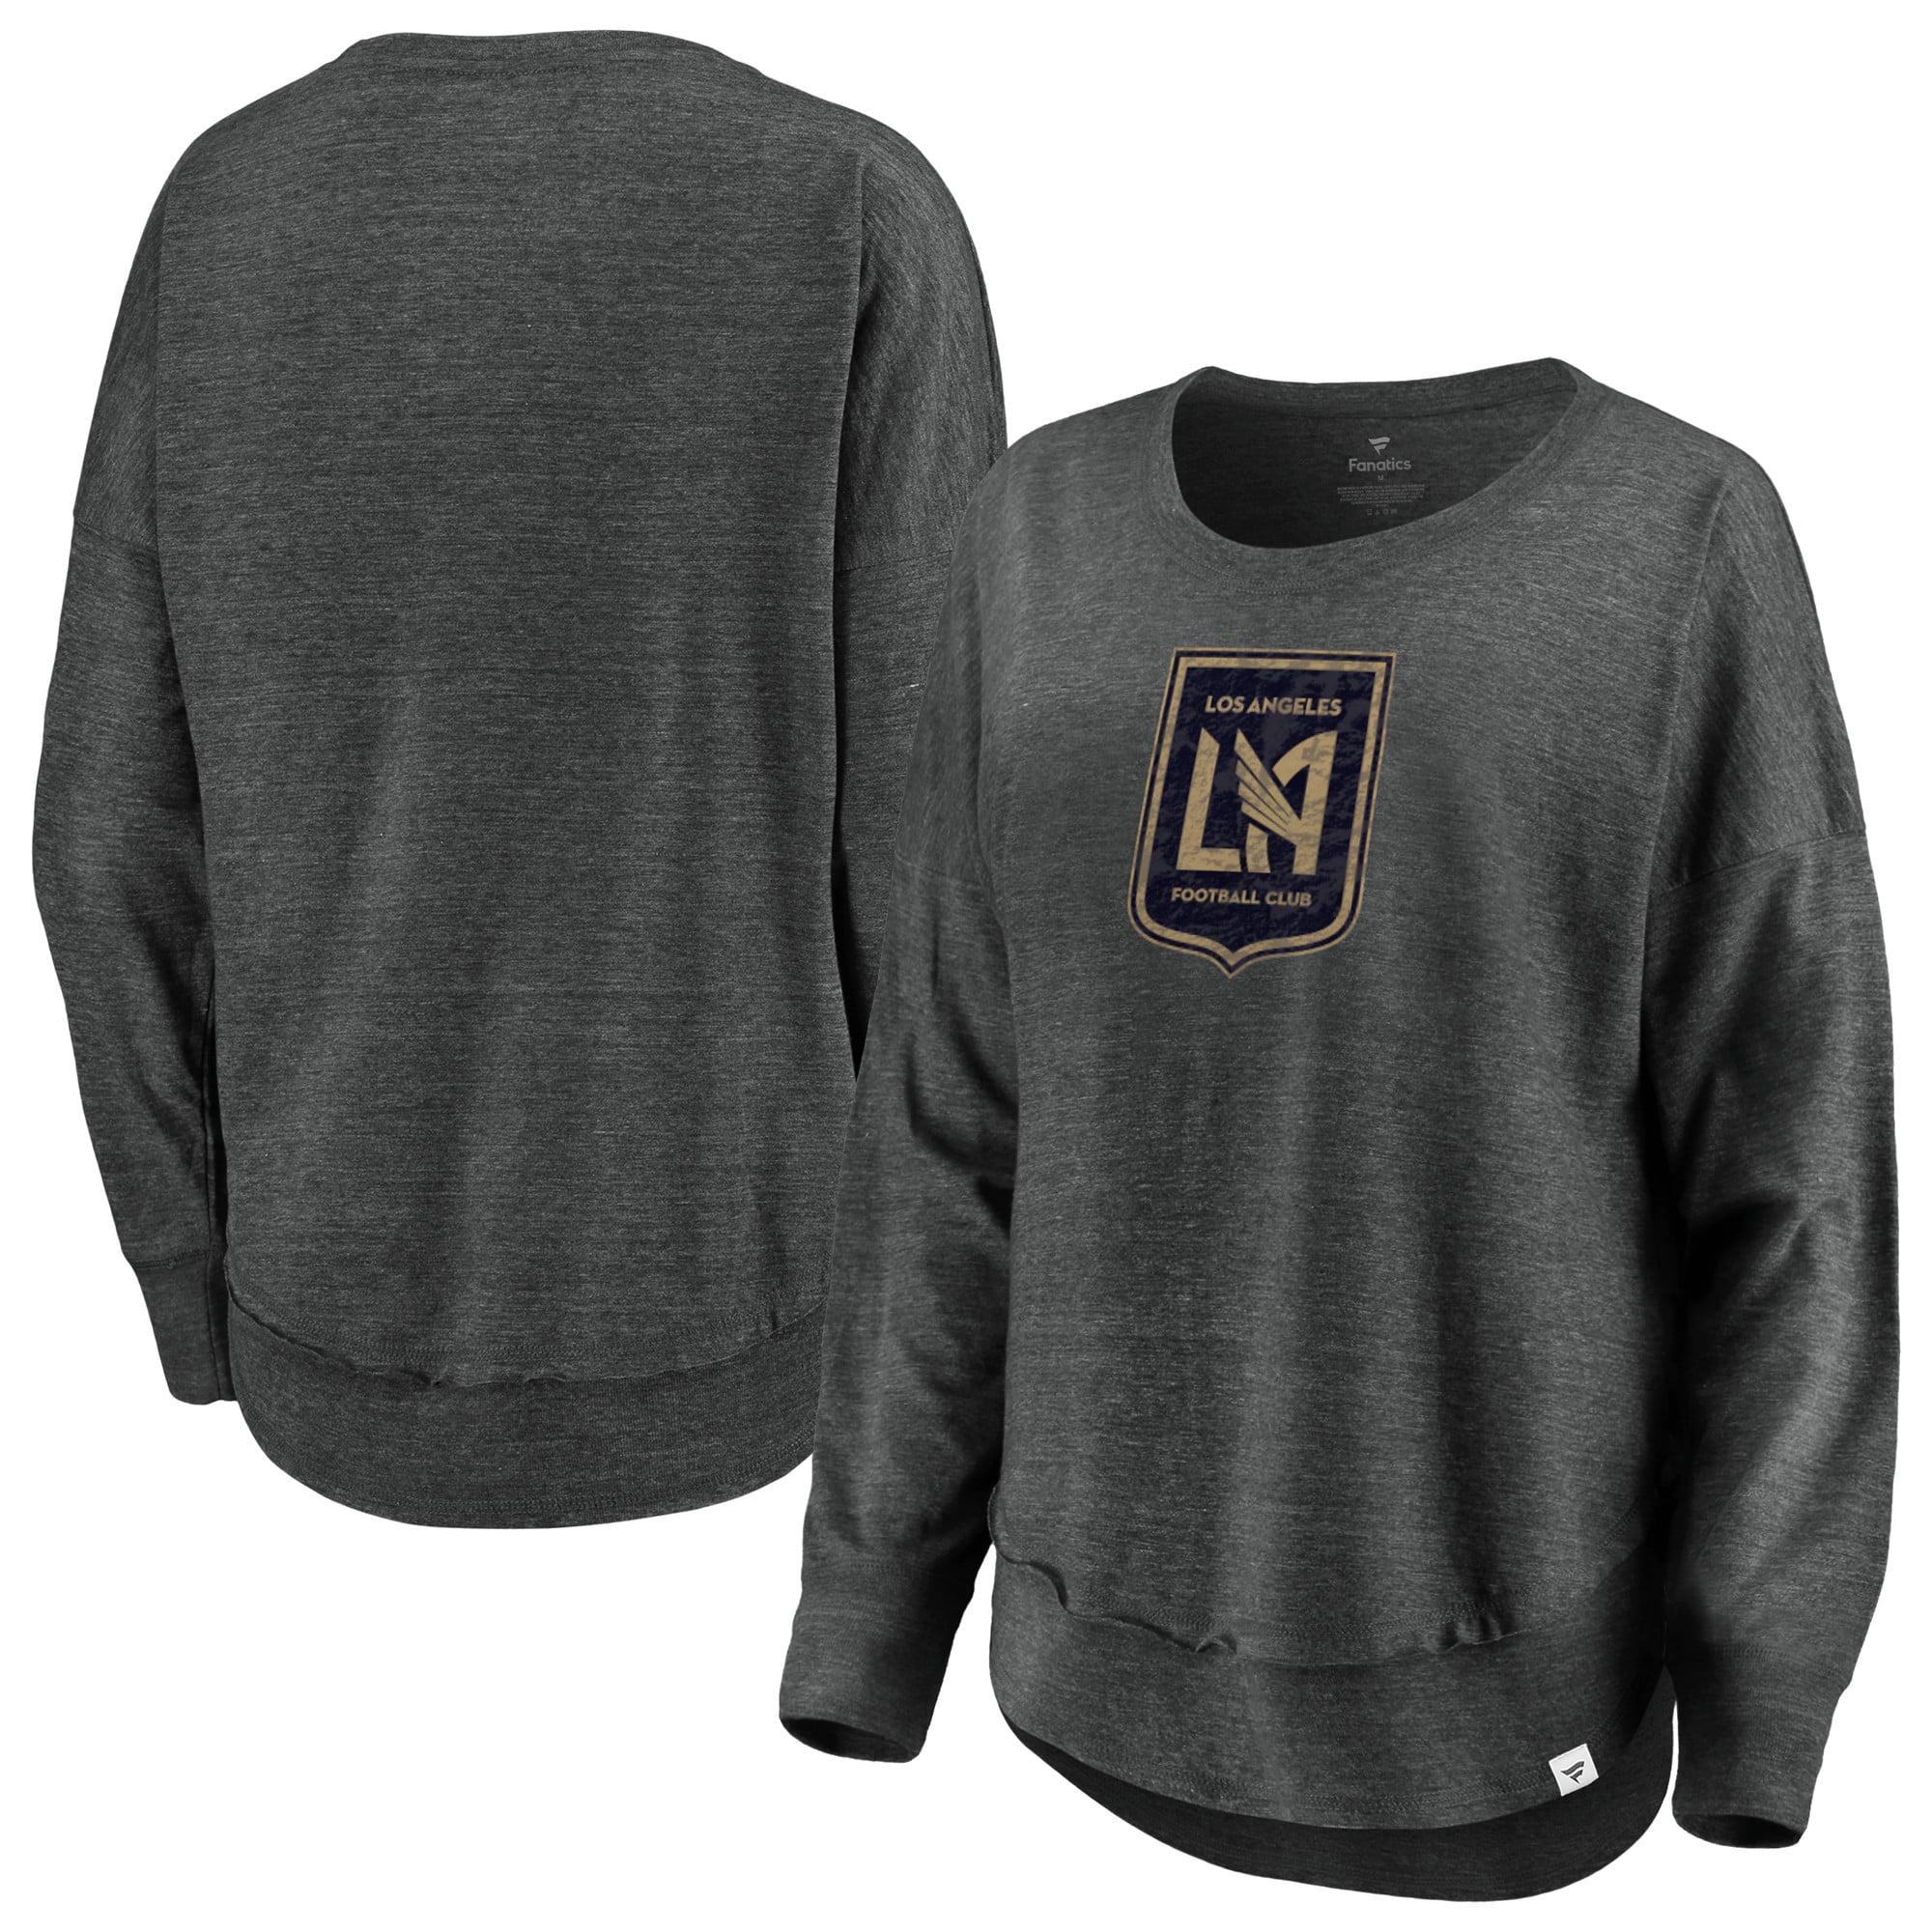 LAFC Fanatics Branded Women's Plus Size True Classics Amaze Tri-Blend Long Sleeve T-Shirt - Charcoal